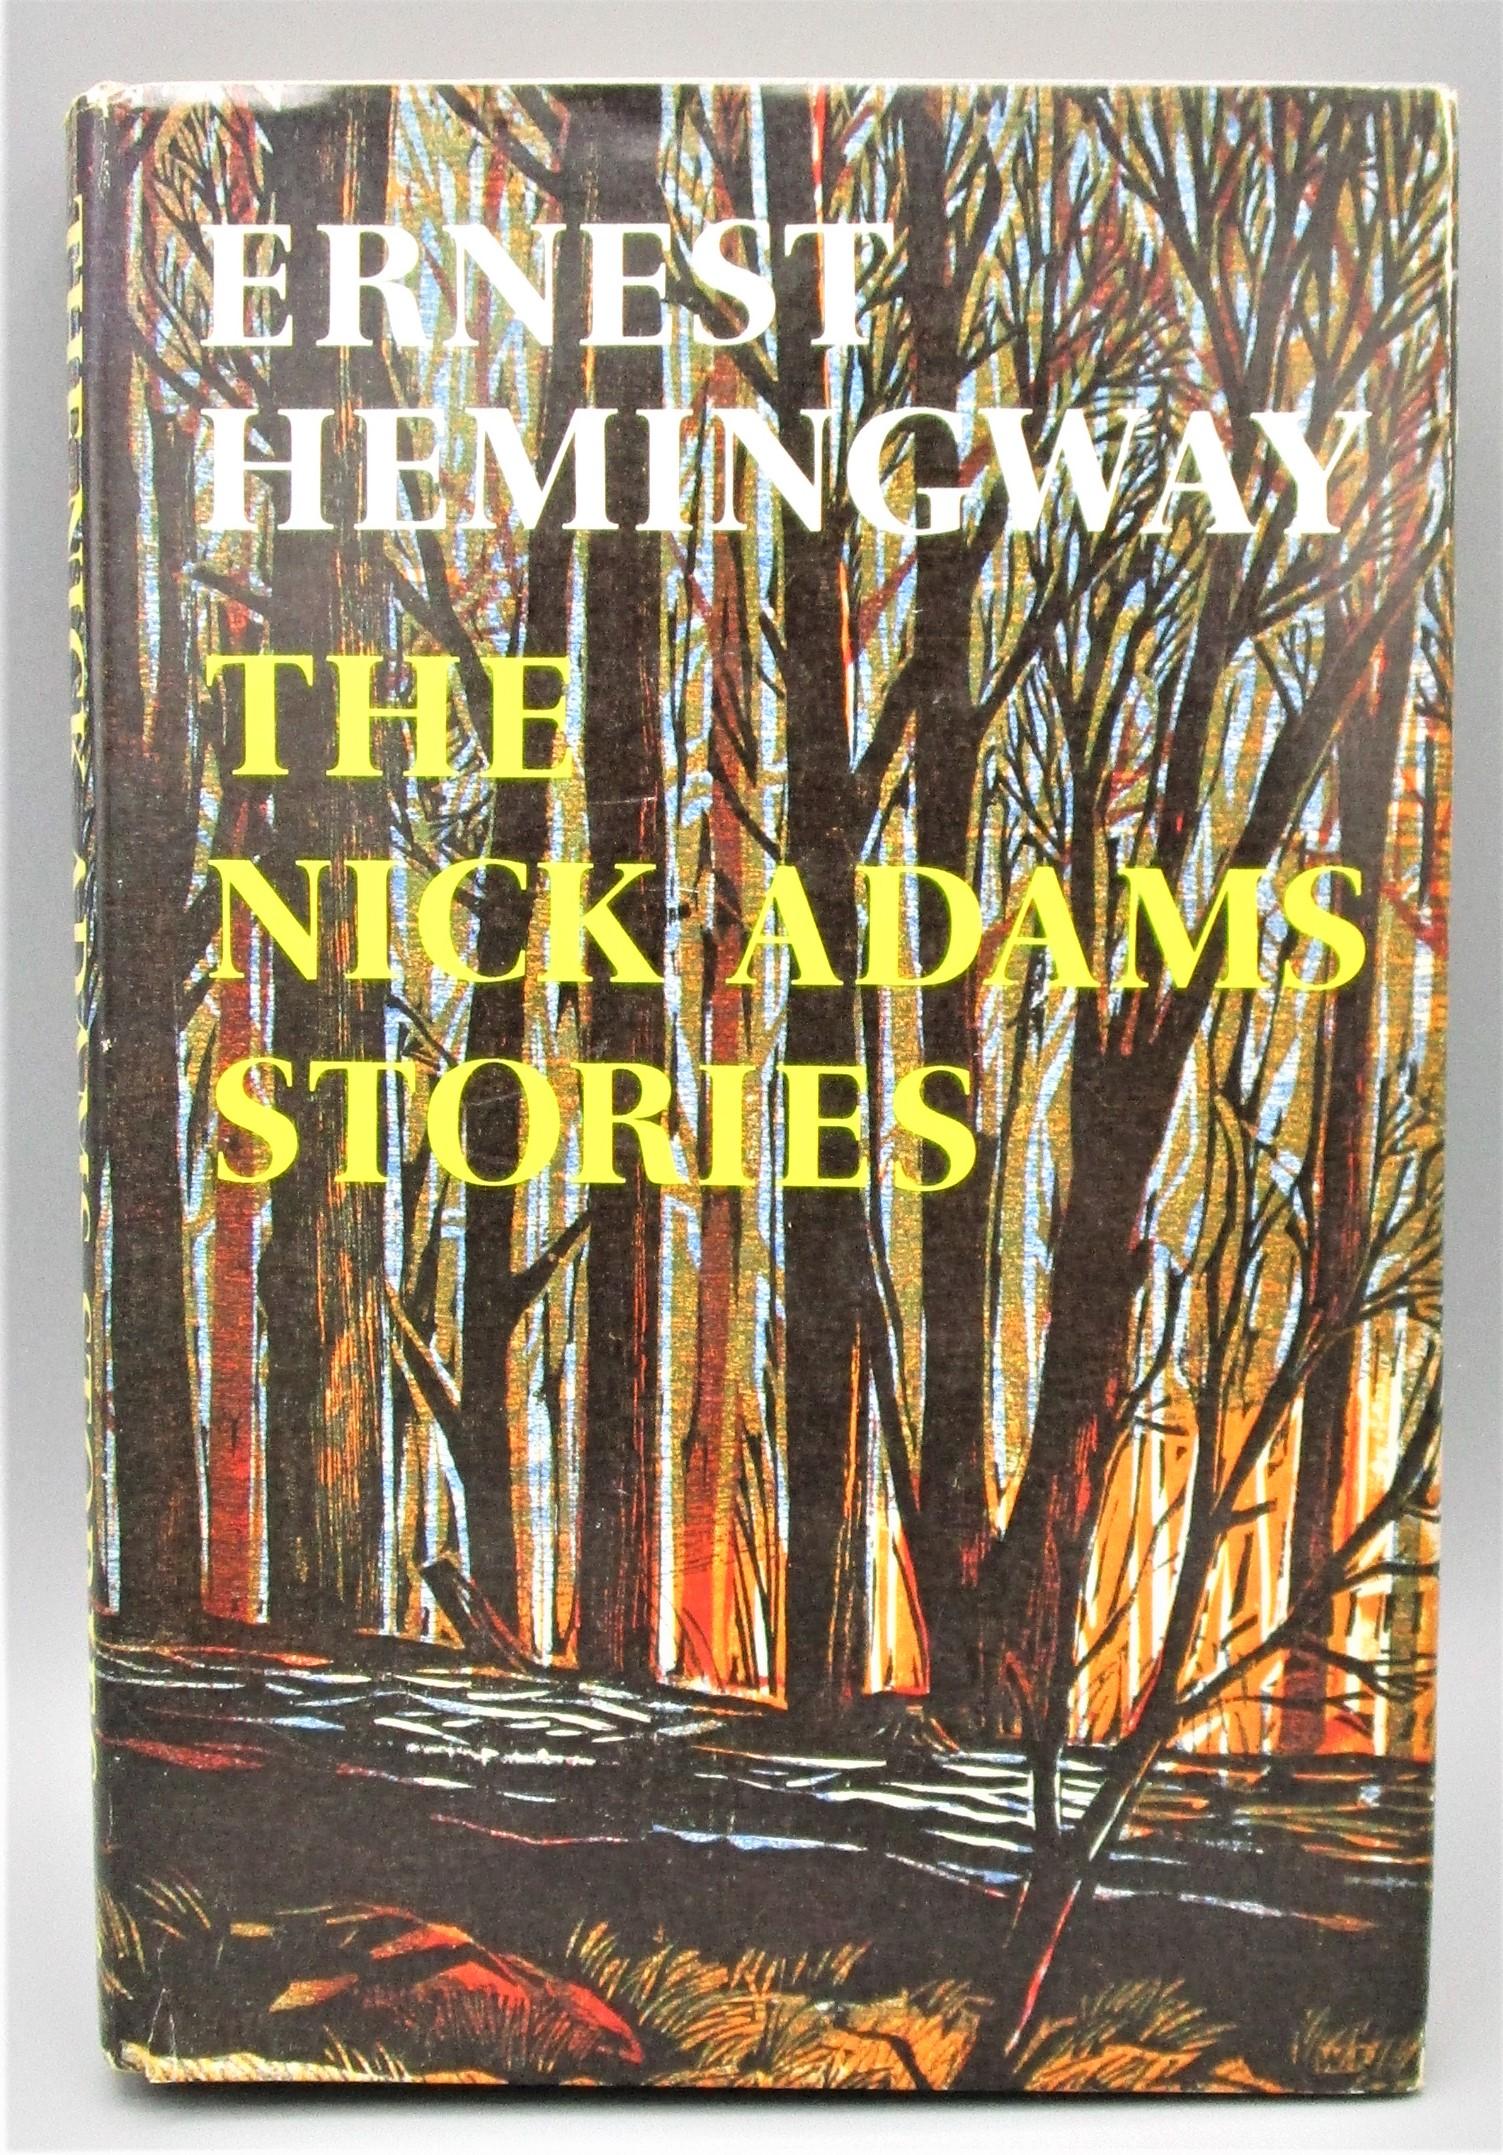 THE NICK ADAMS STORIES, by Ernest Hemingway - 1972 [Review Copy] *Ephemera*